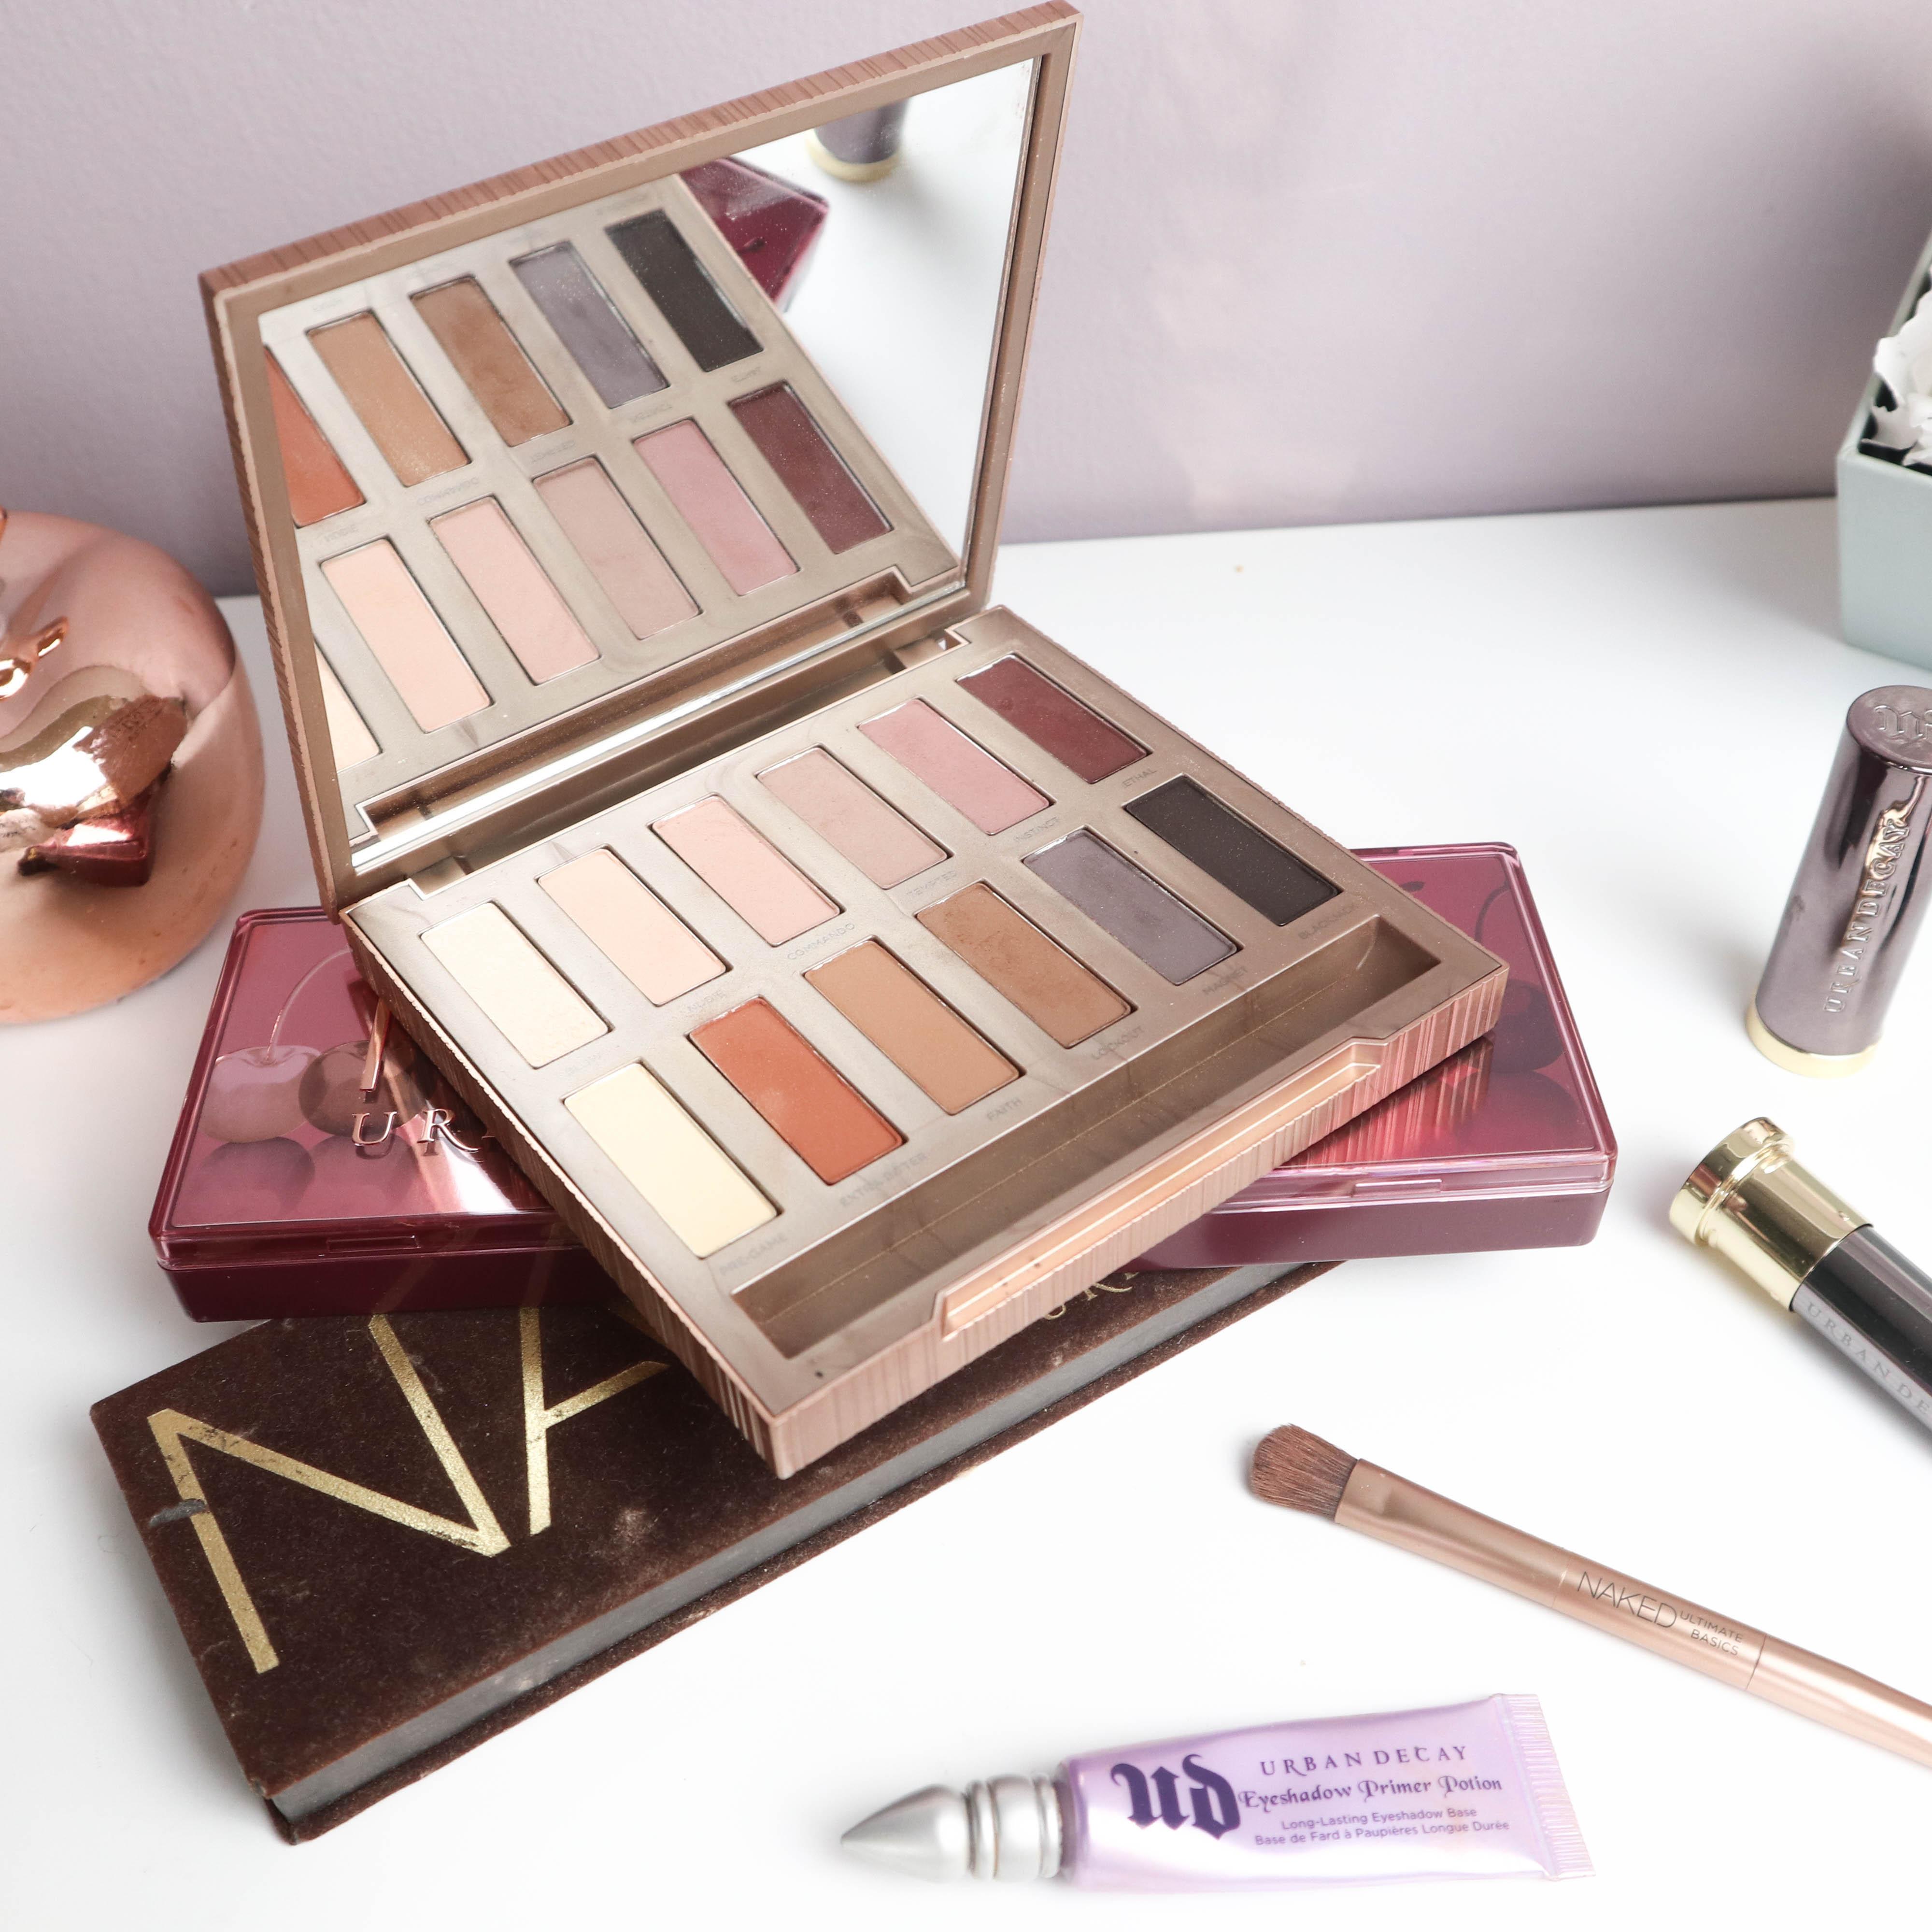 top 5 beauty brands lieblings beauty marken kardiaserena urban deca naked eye shadow palette Naked 1 all nighter fixing spray cherry ultimate basics